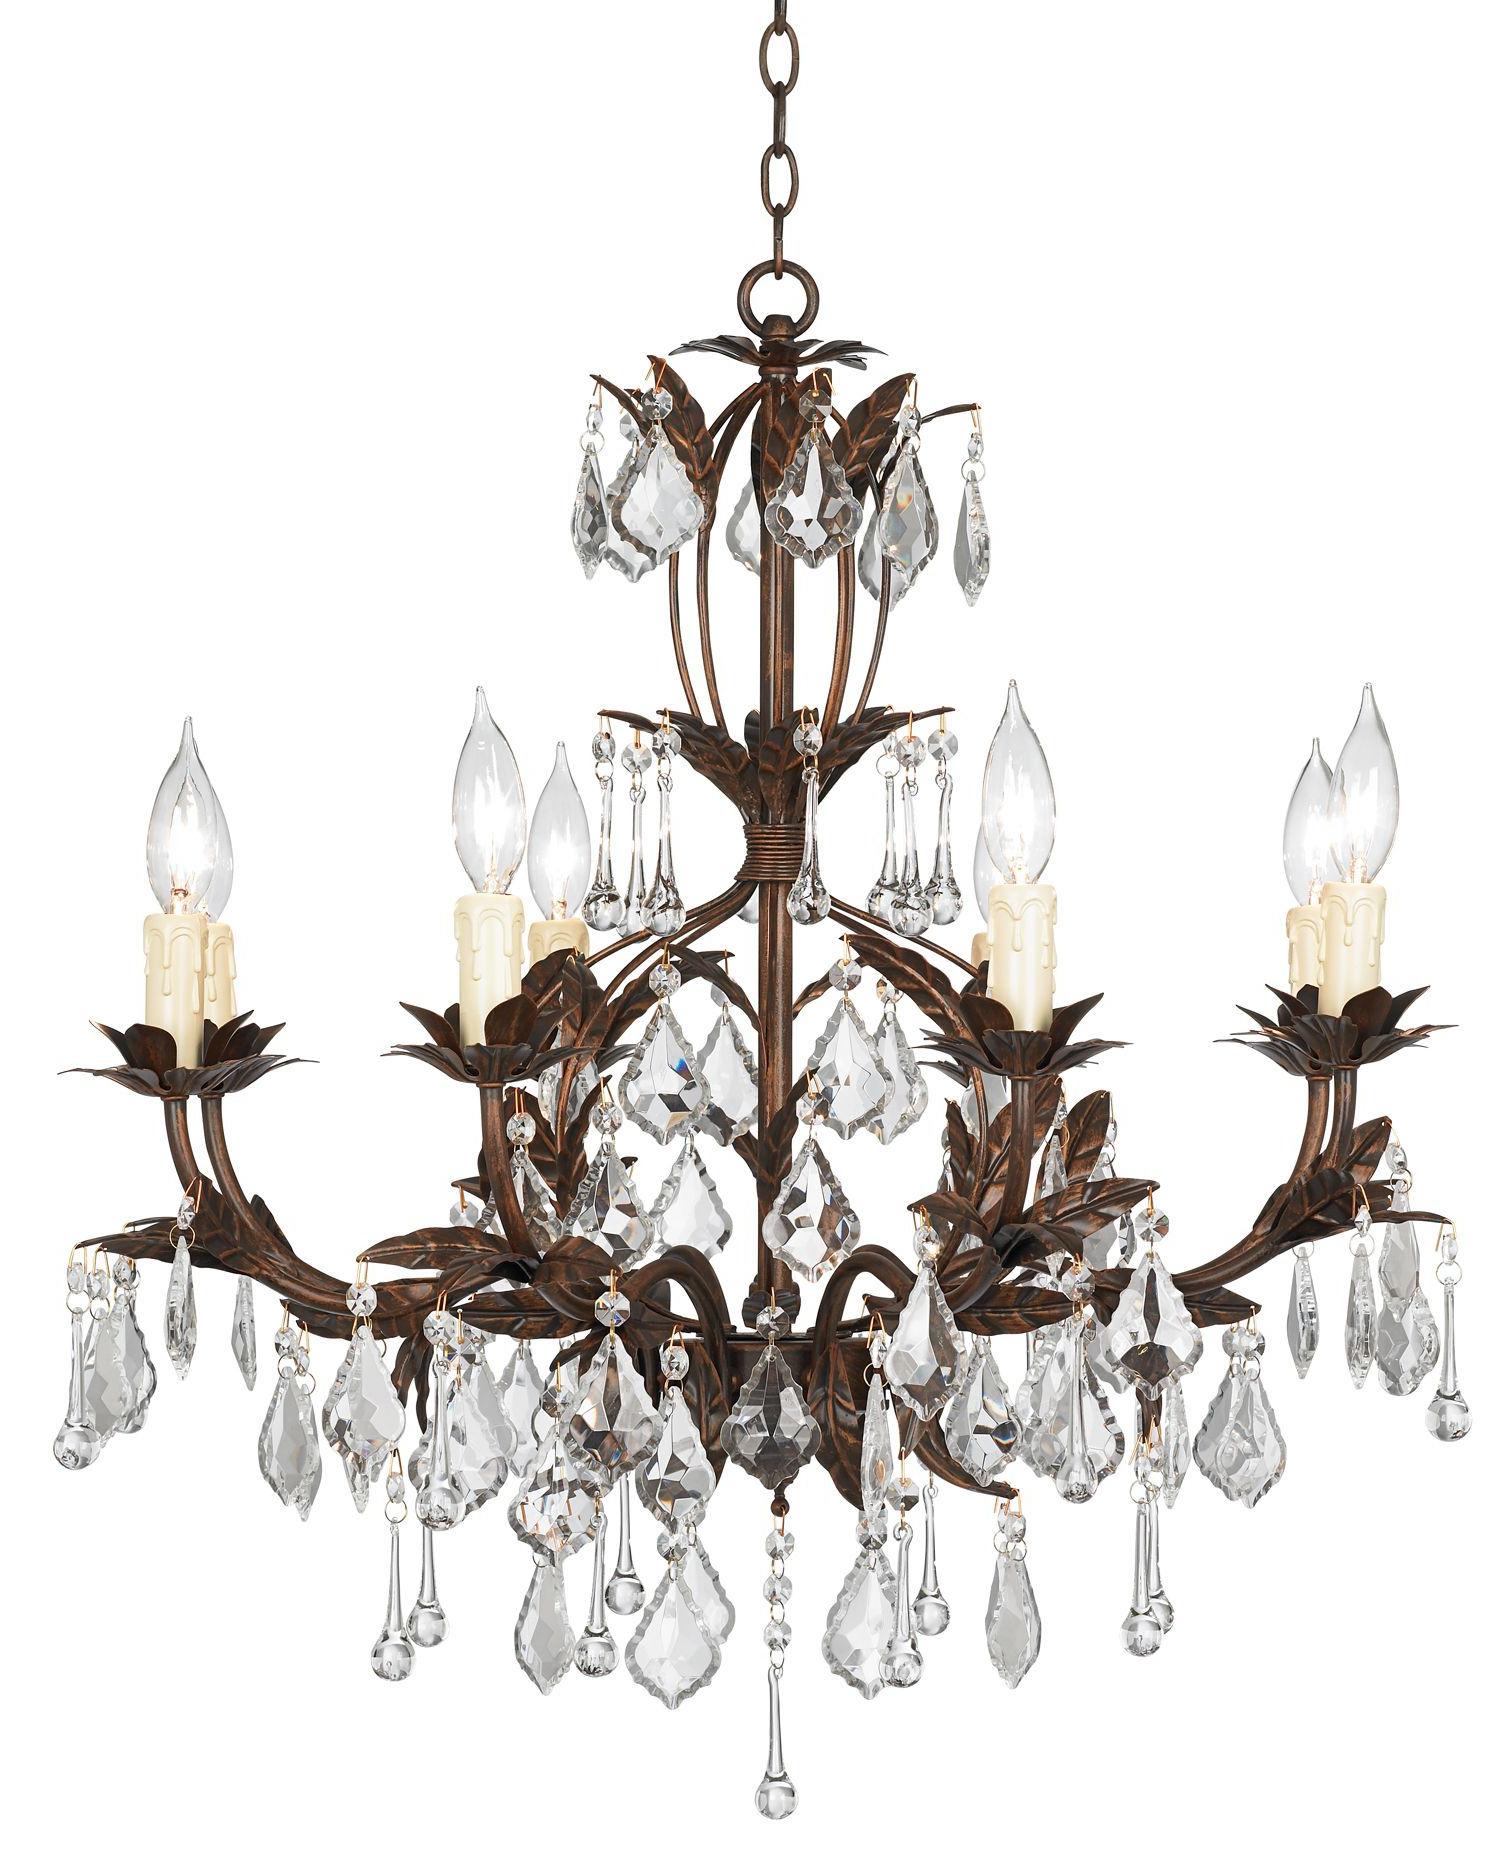 "2020 Hesse 5 Light Candle Style Chandeliers Inside Kathy Ireland Venezia Bronze 8 Light 26"" Wide Chandelier (View 18 of 25)"